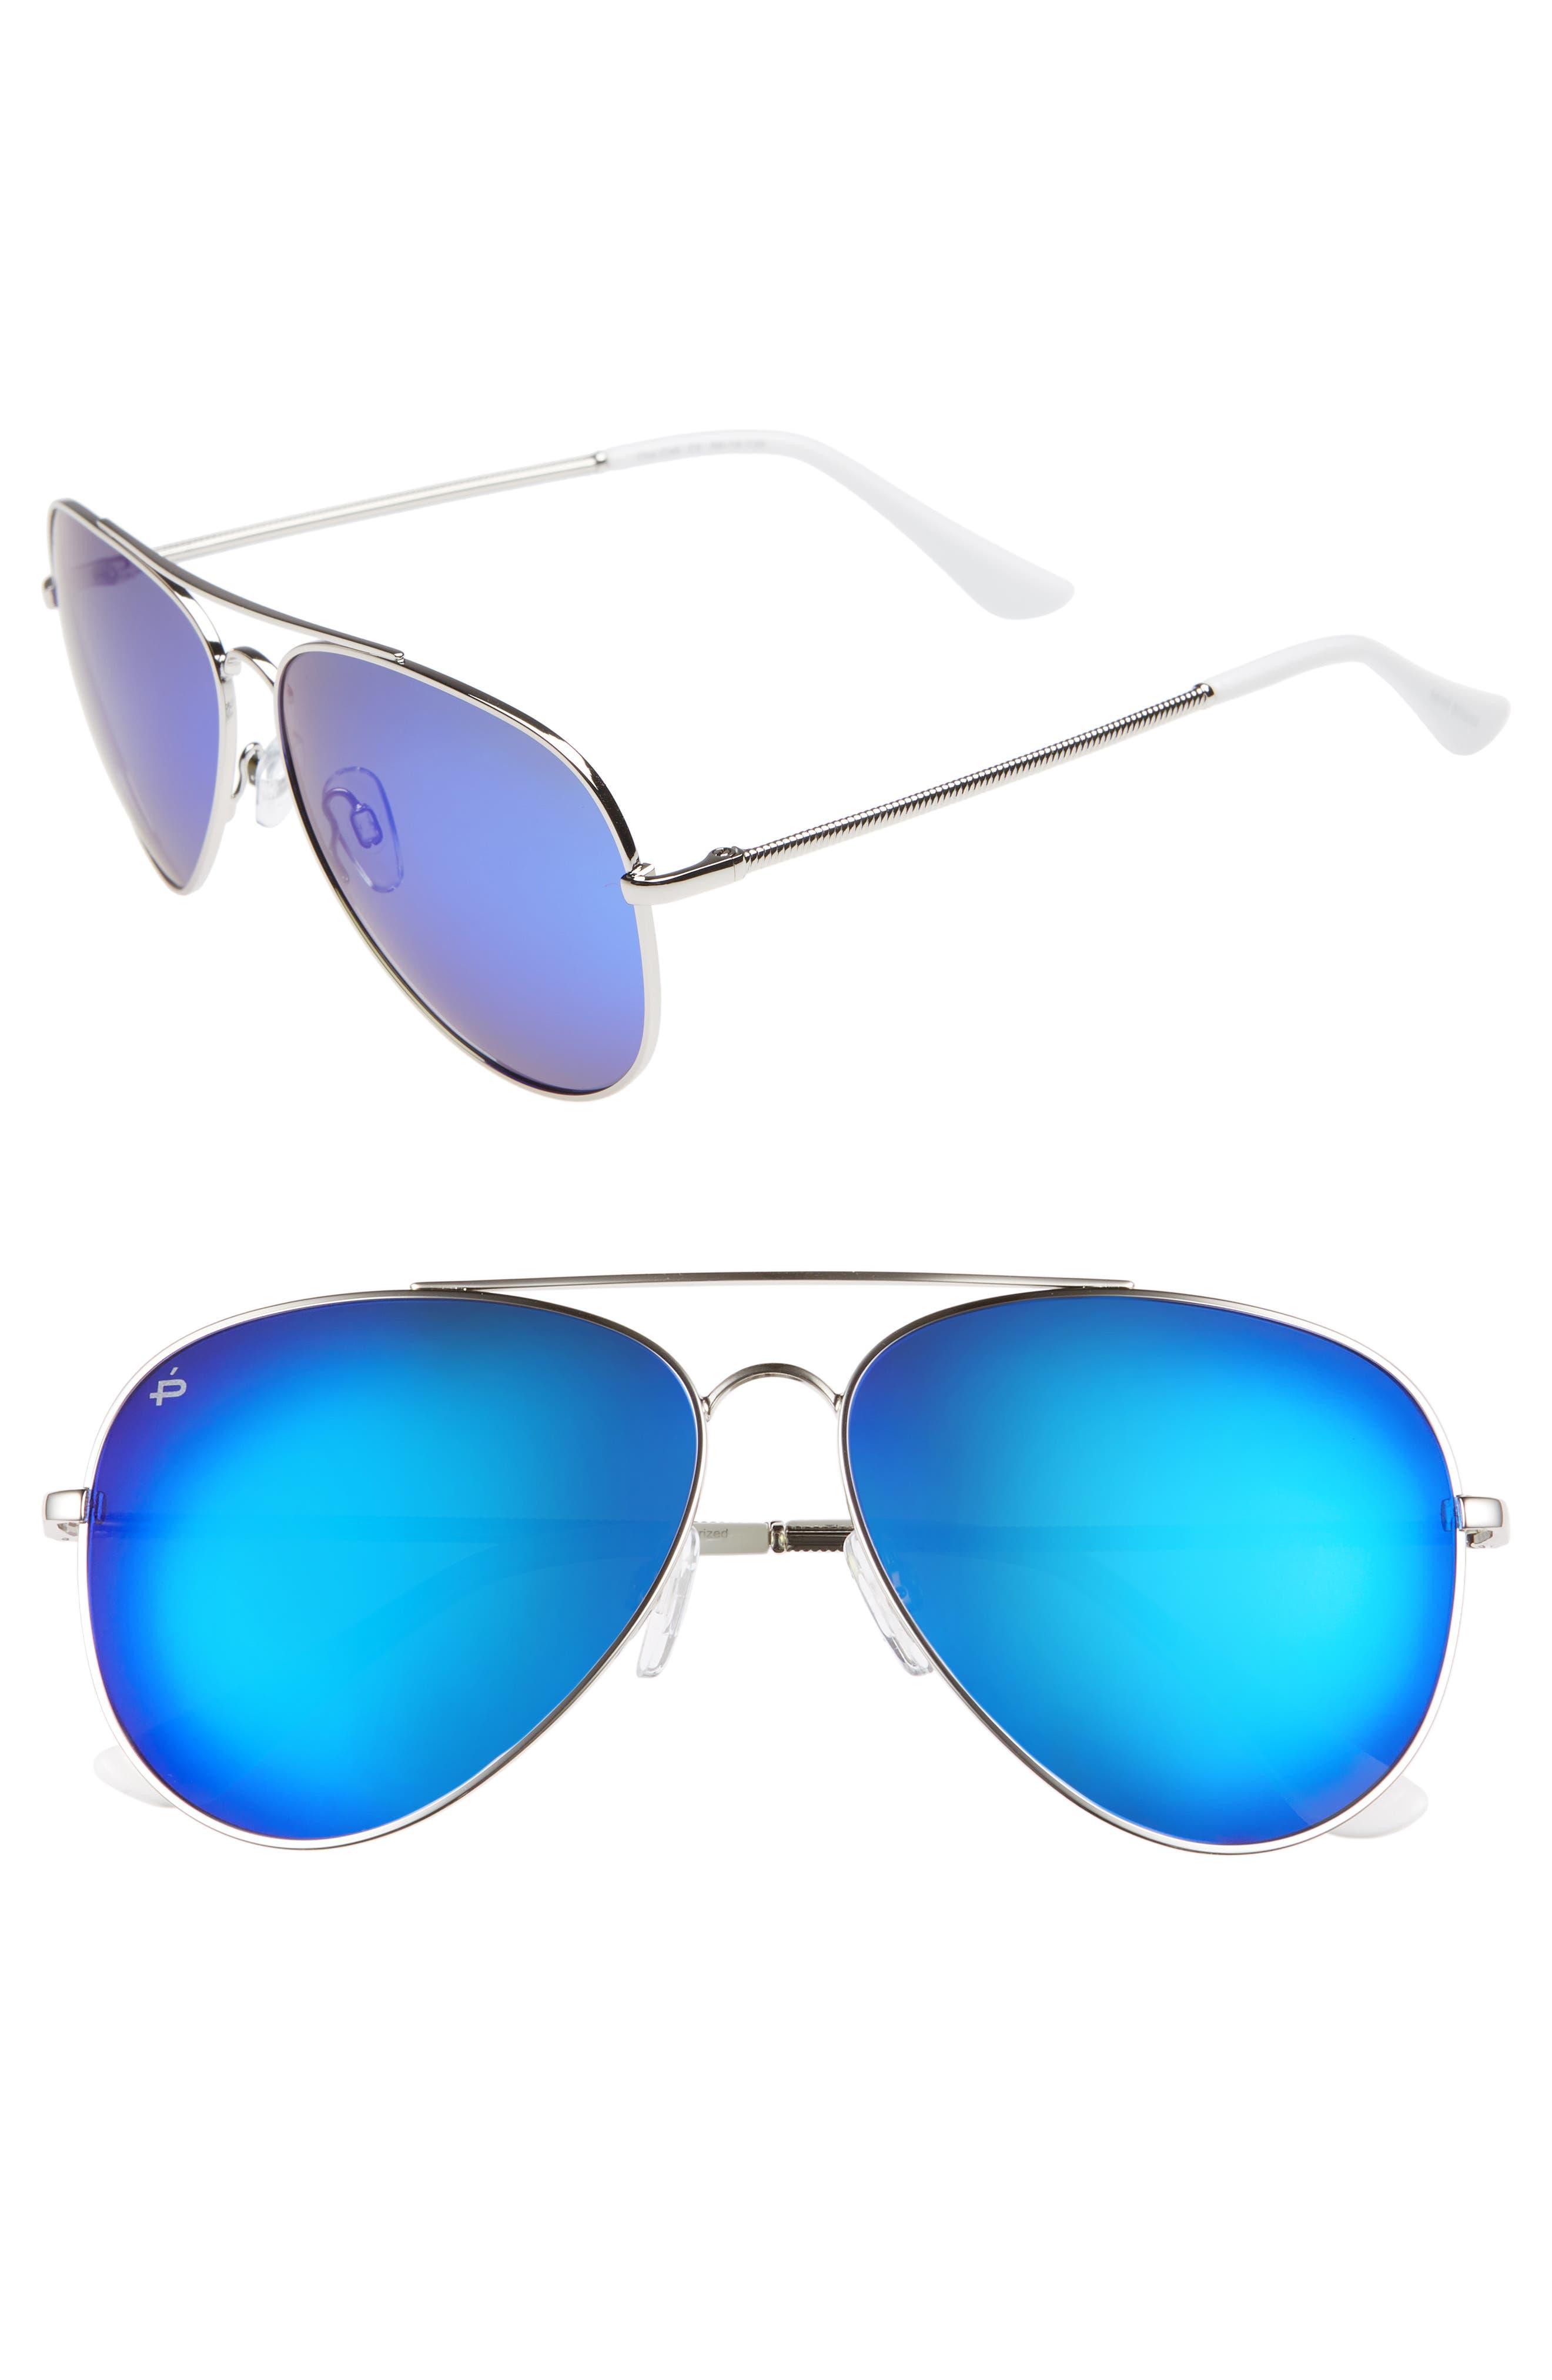 Privé Revaux The Cali Polarized 59mm Sunglasses,                             Main thumbnail 1, color,                             NICKEL SILVER